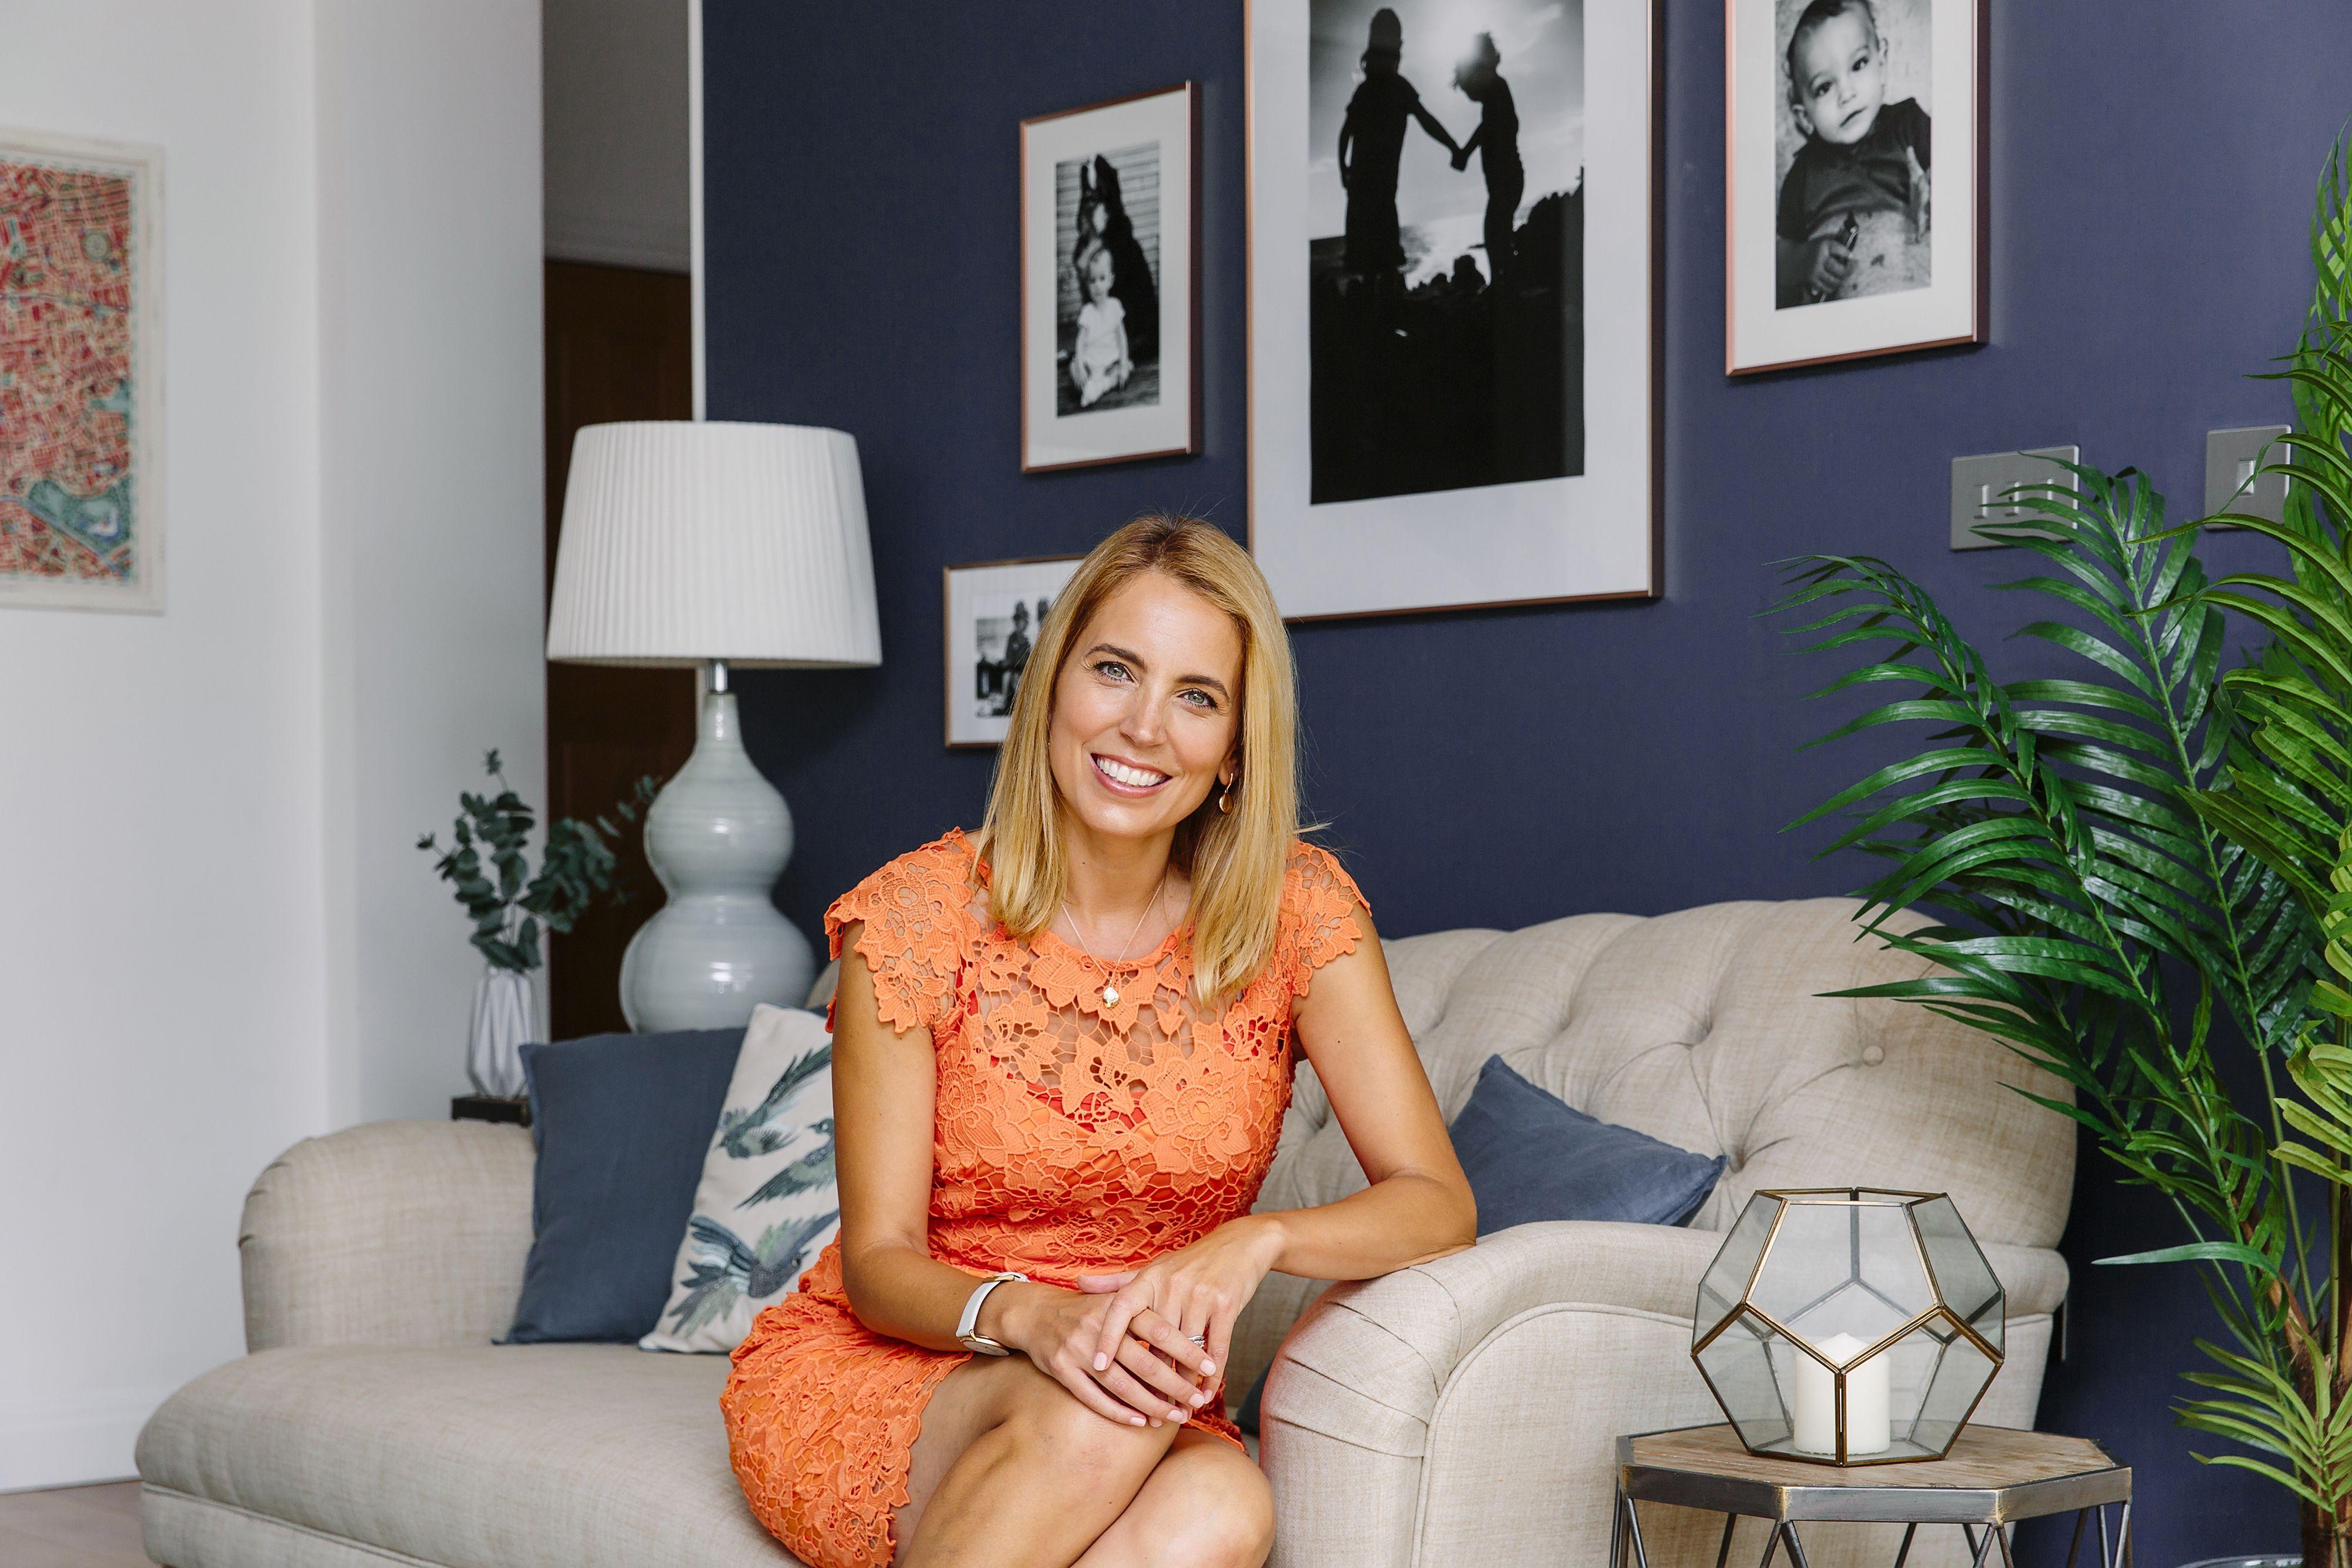 Inside A Place in the Sun presenter Jasmine Harman's stunning 'vegan' home